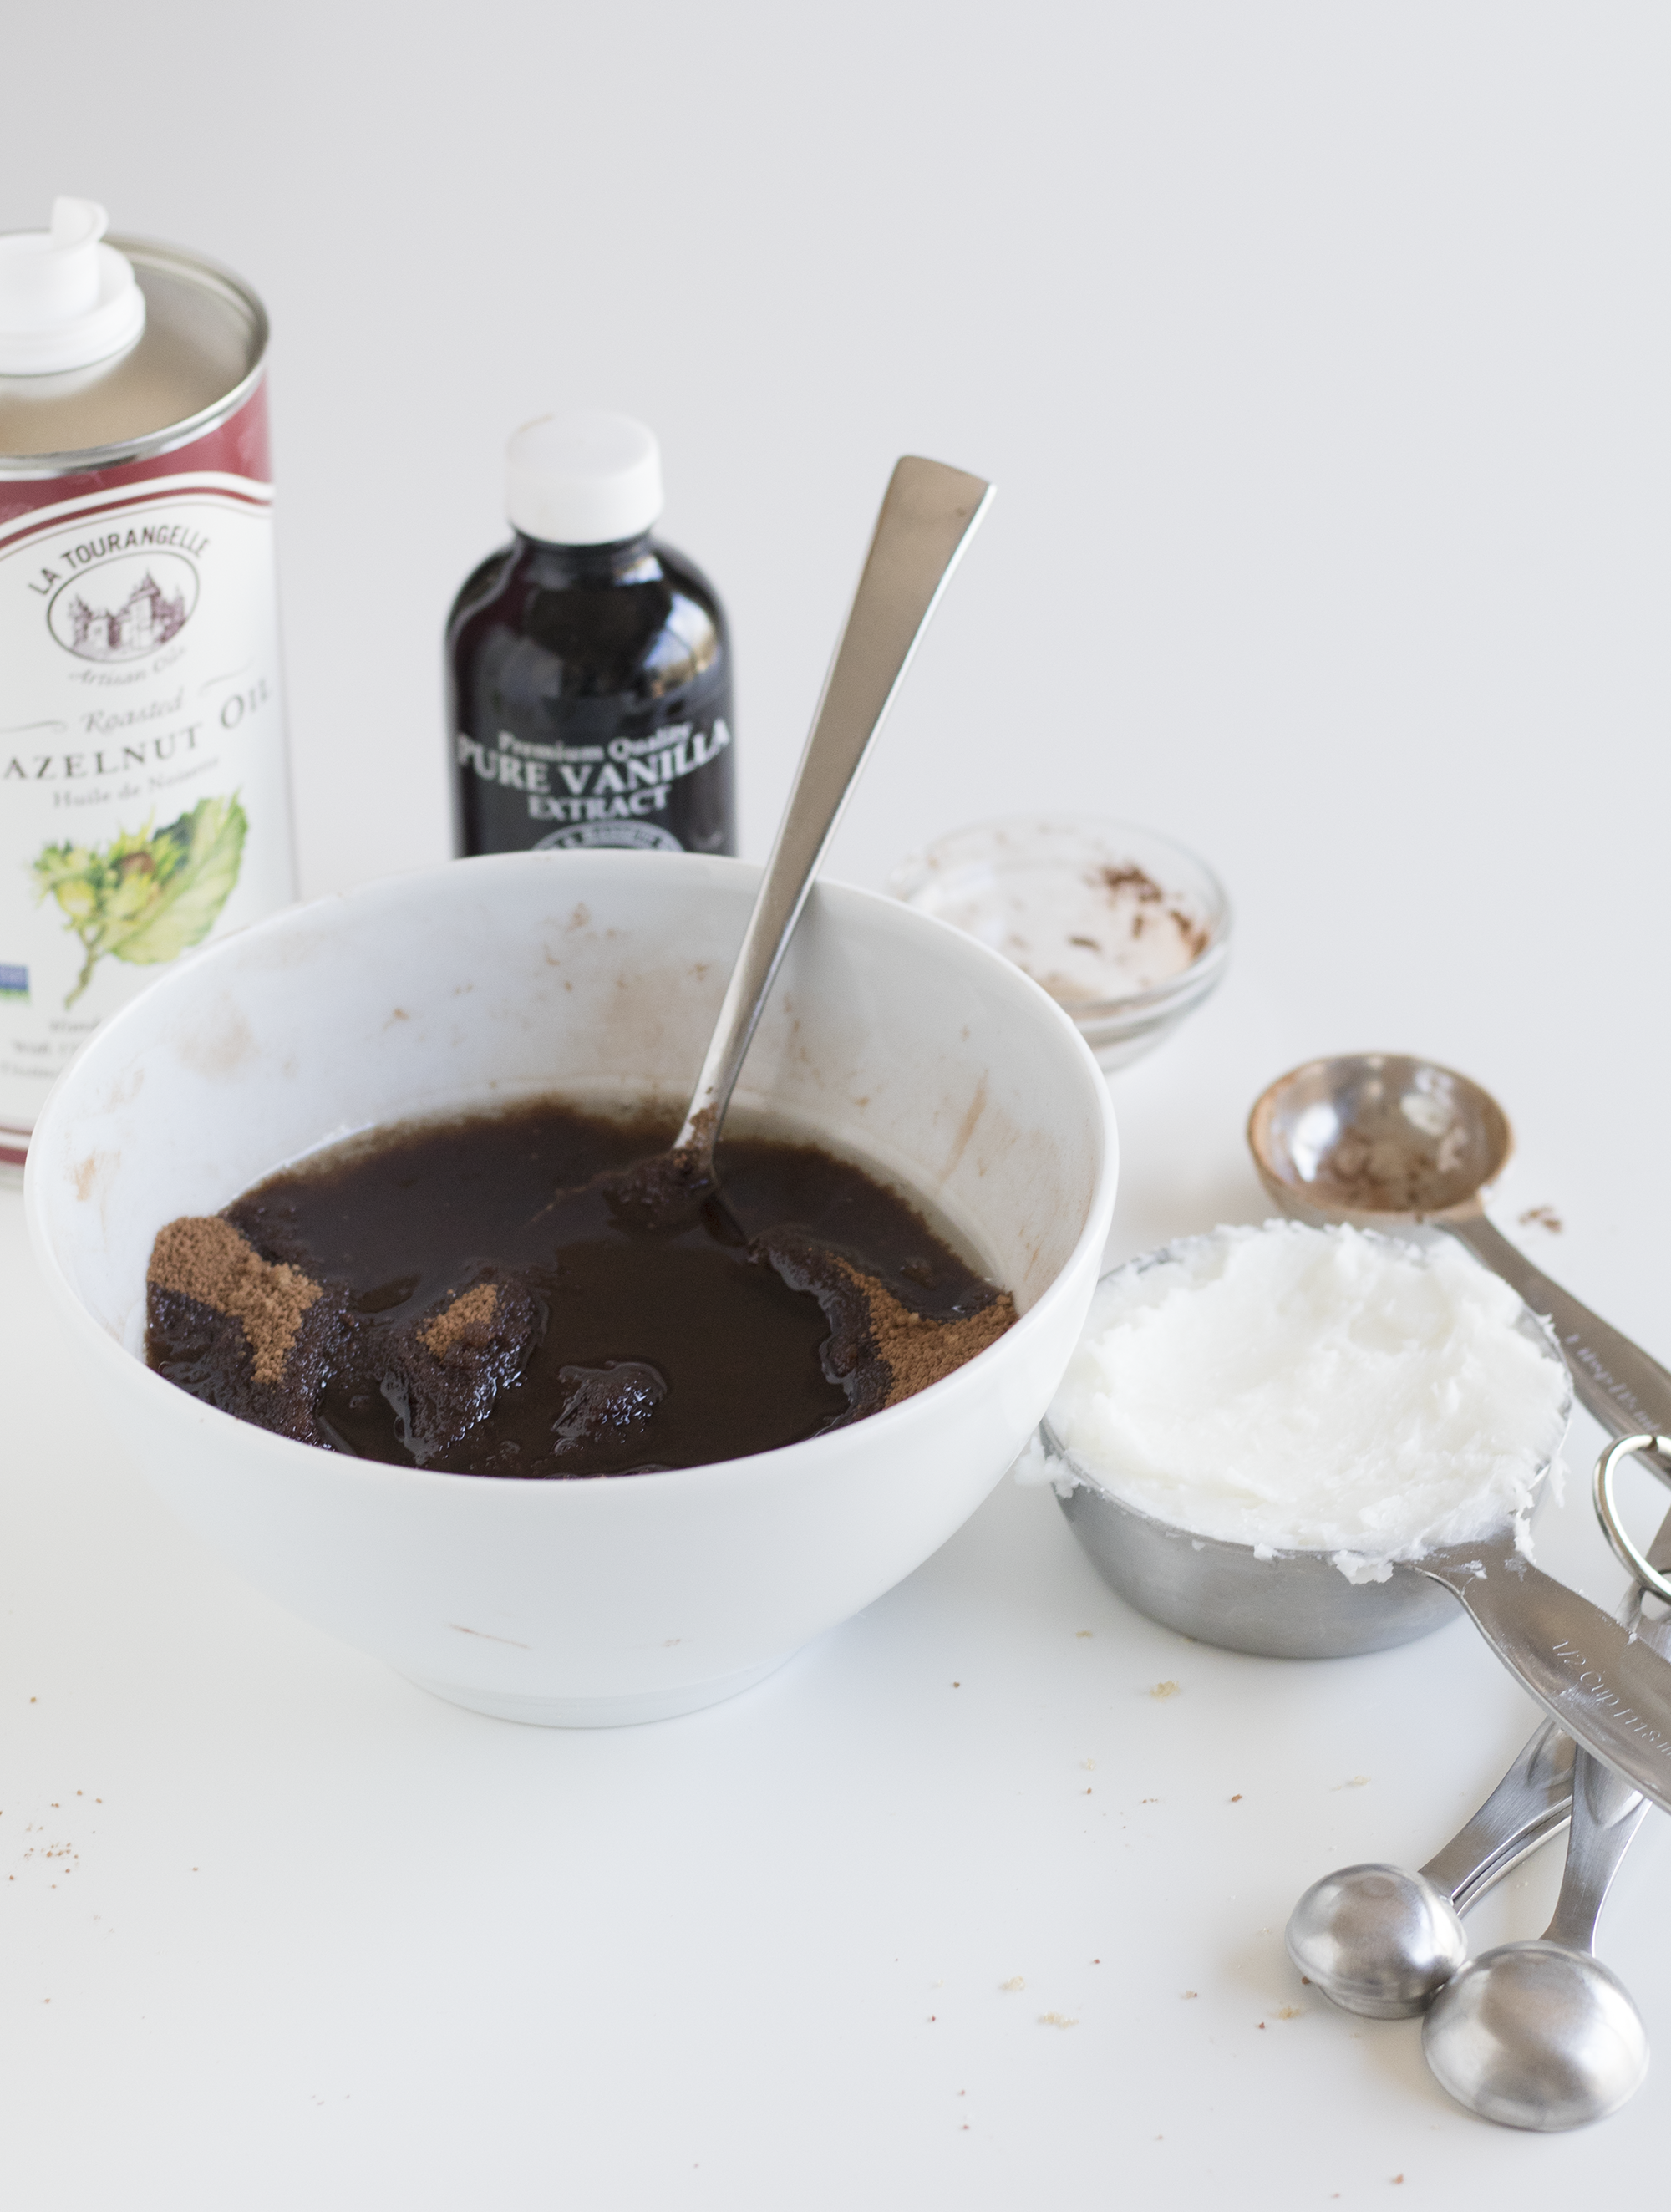 Cocoa Hazelnut Body Scrub | Sarah Makes Stuff